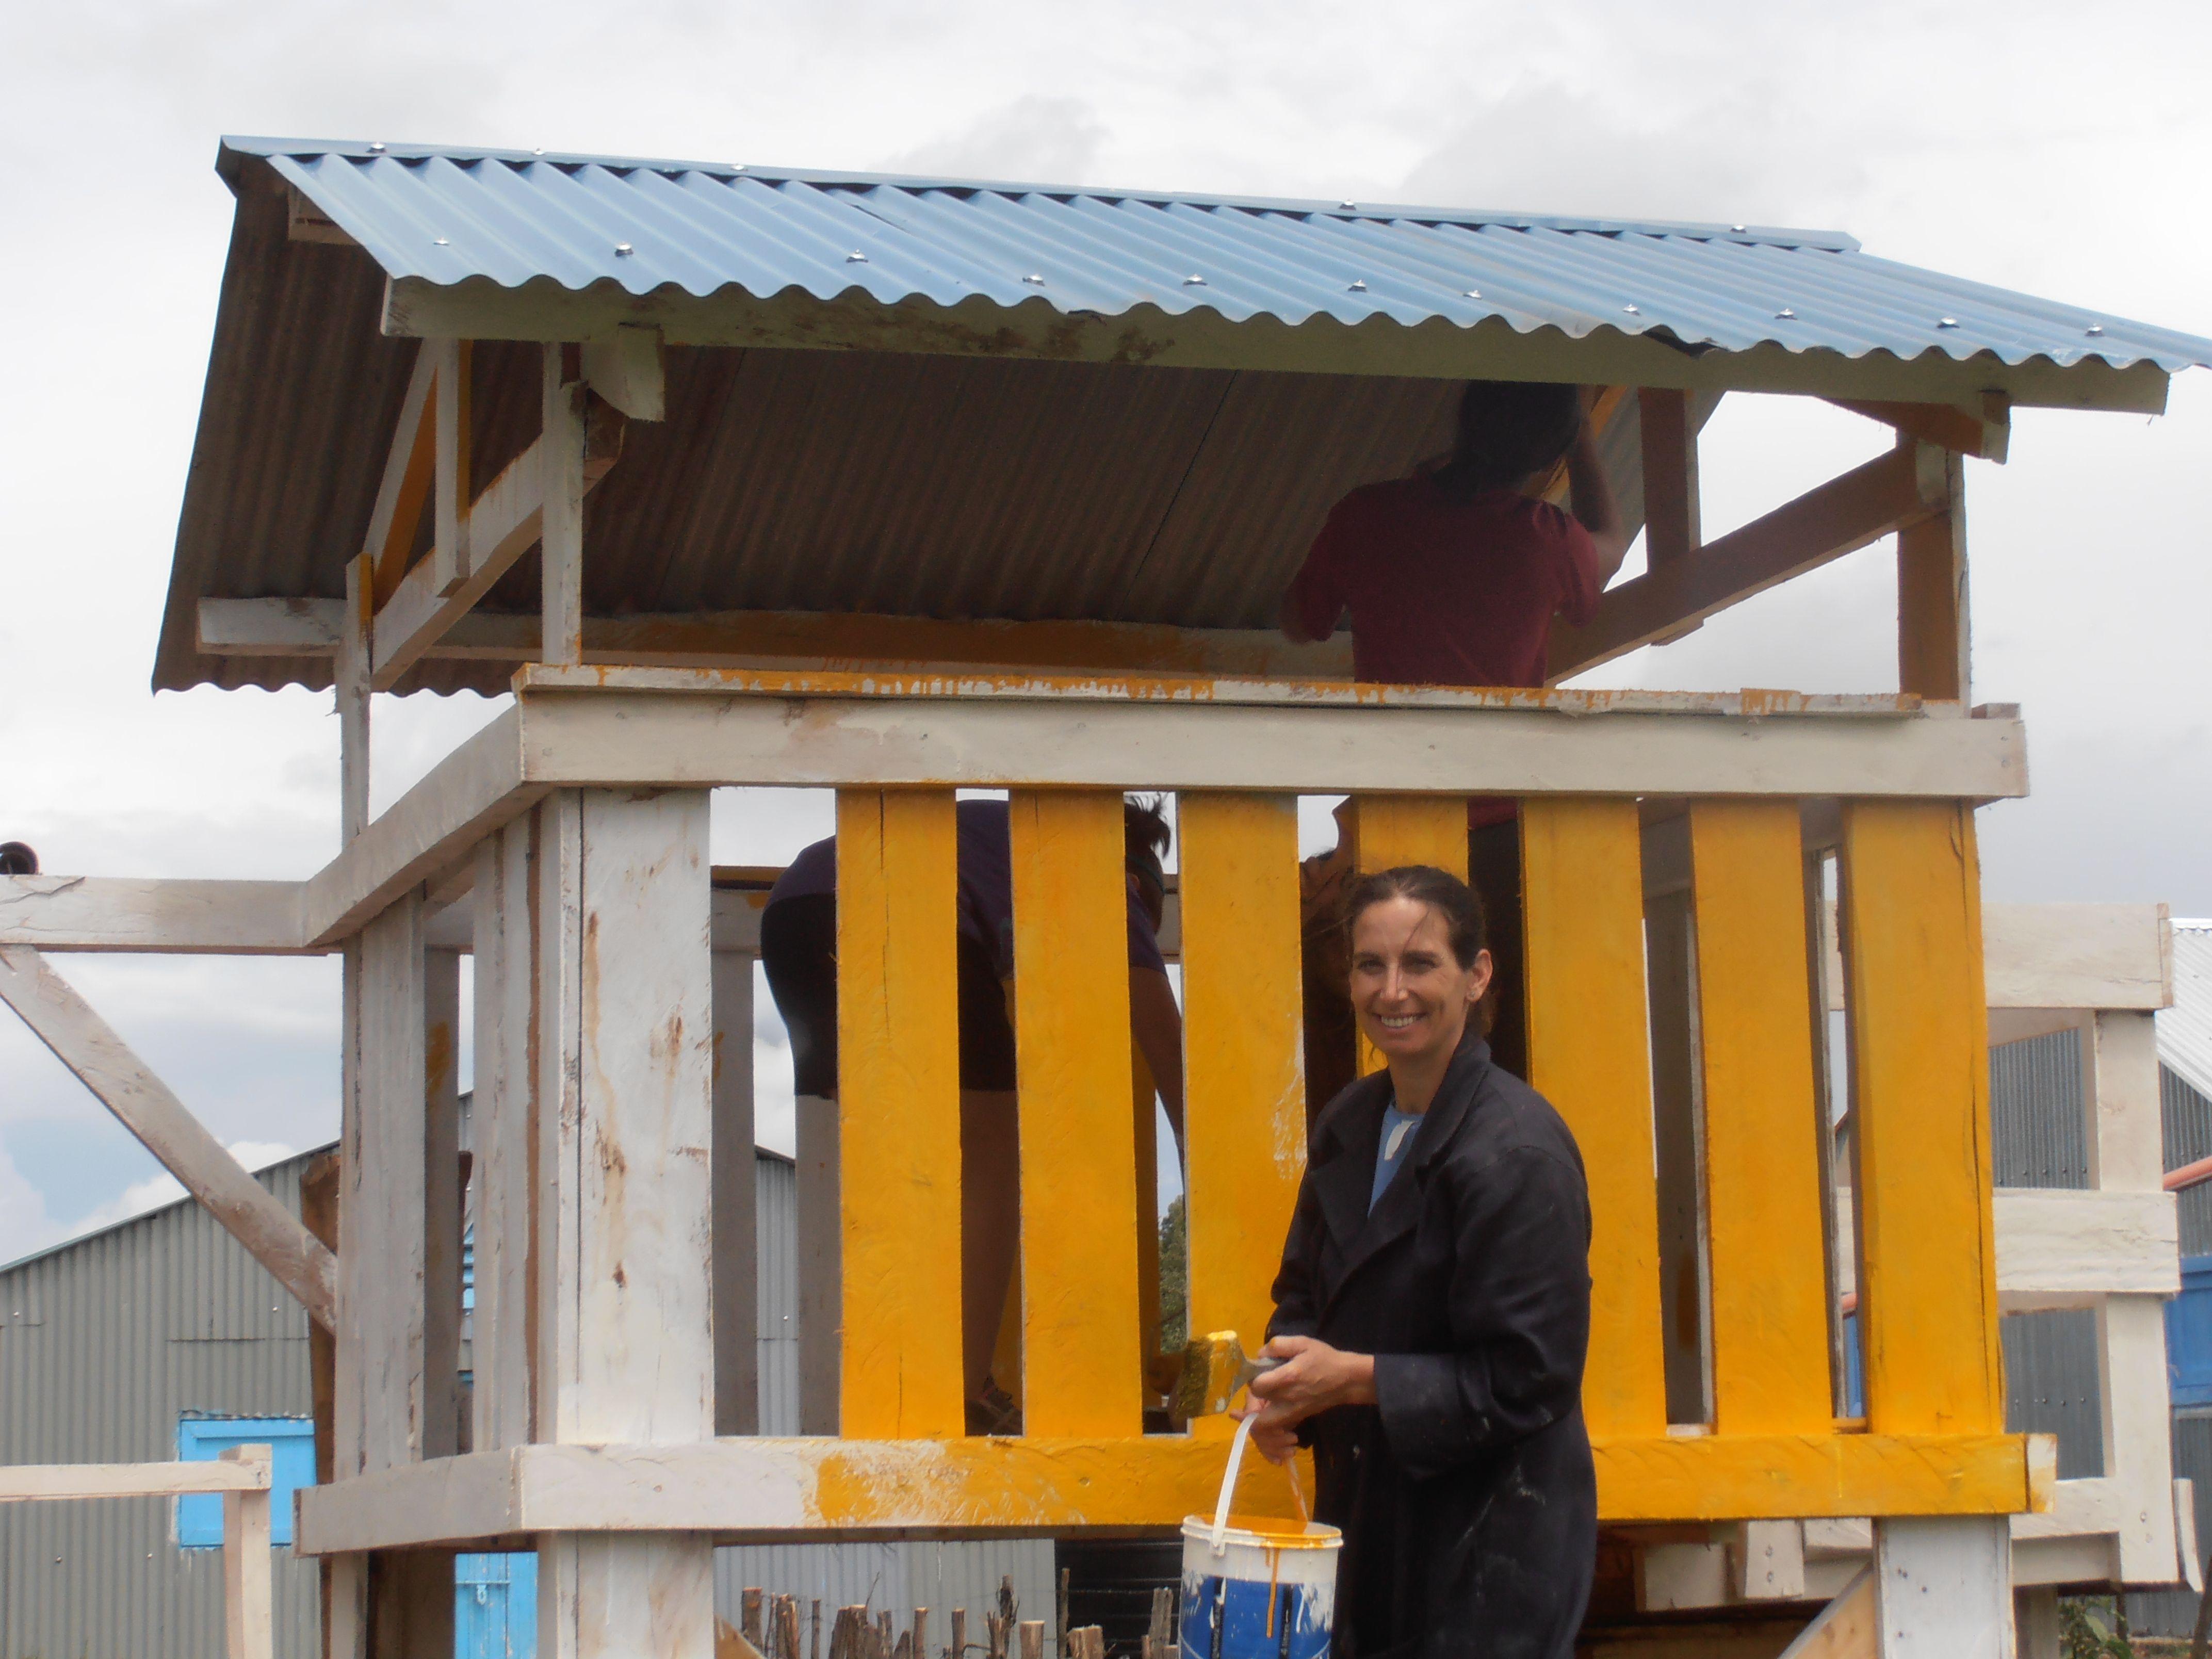 Volunteering her time building a playground for orphanage children near Bomet, Kenya